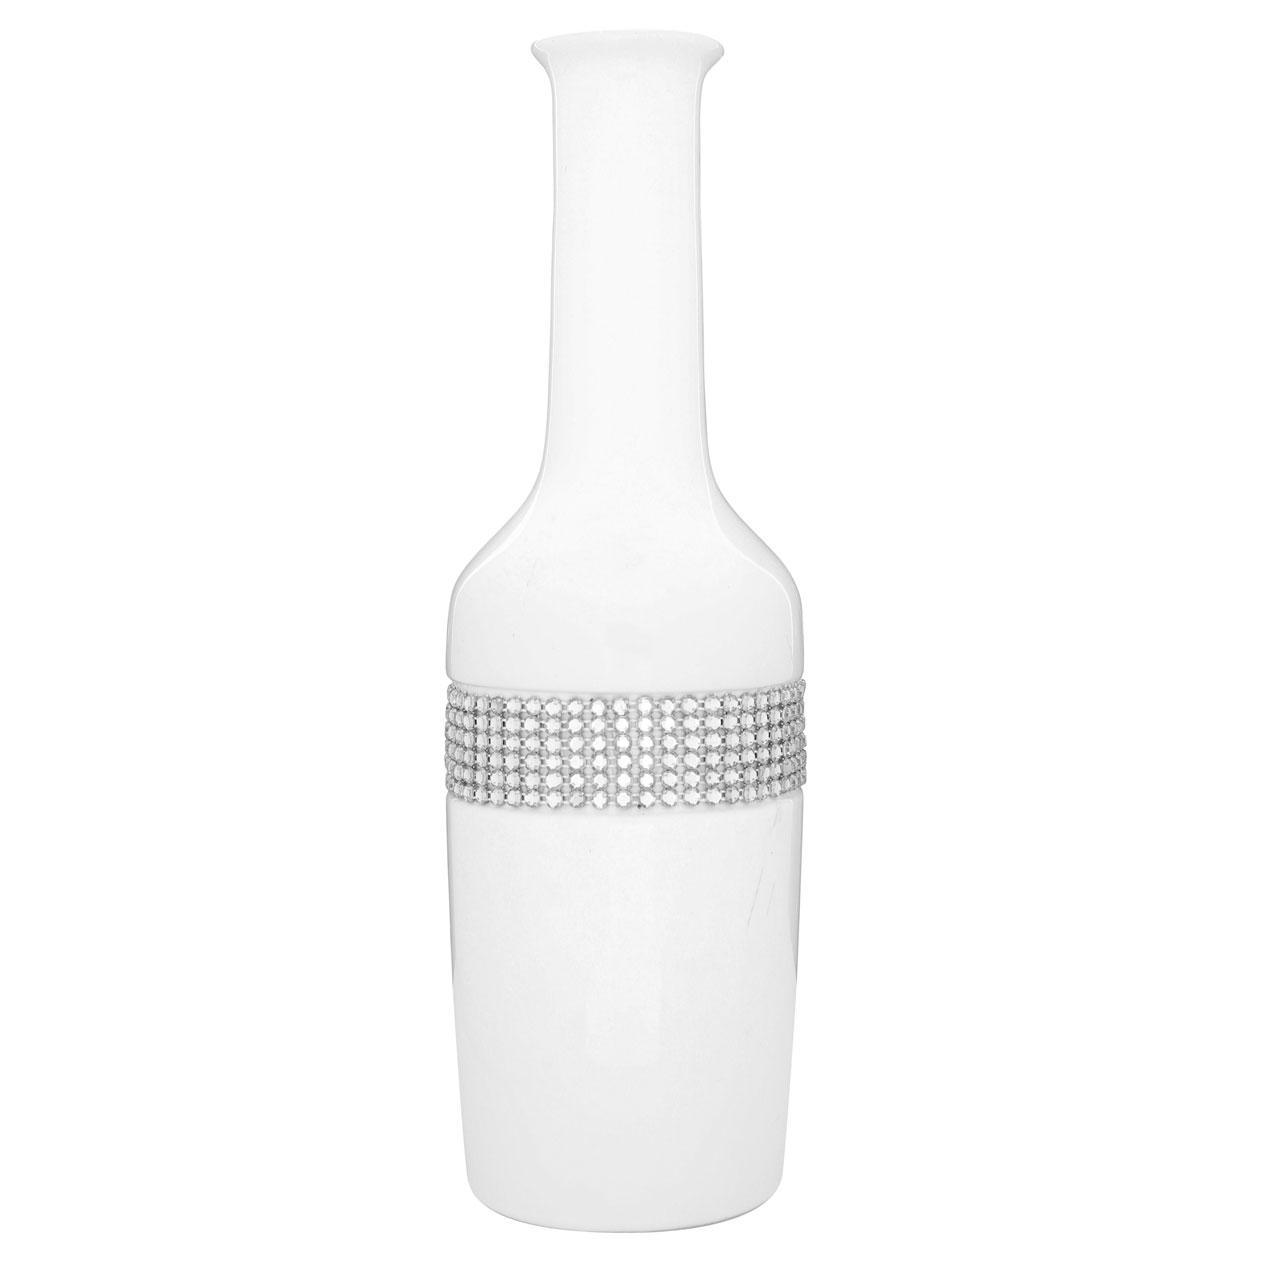 Radiance White Vase